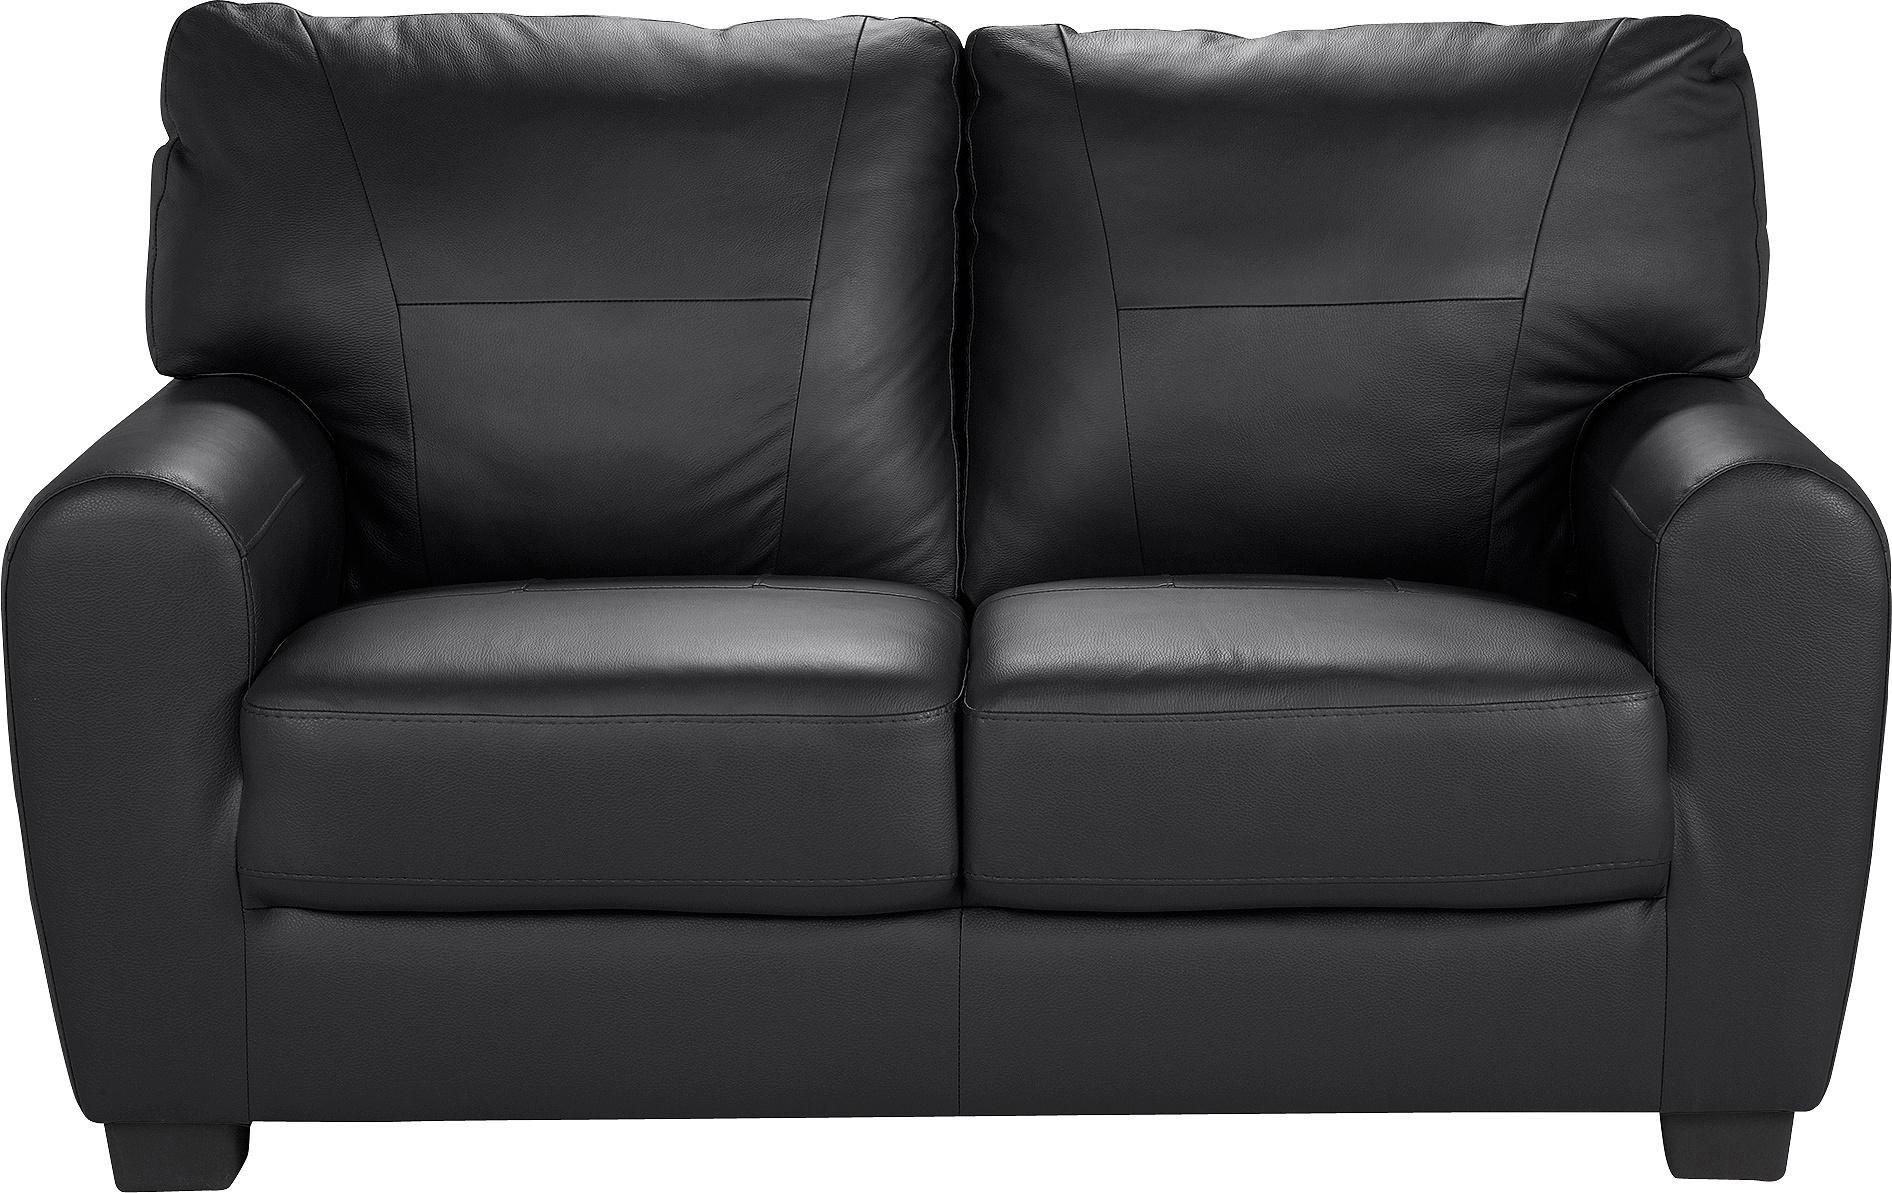 Argos Home Stefano 2 Seater Sofa - Black